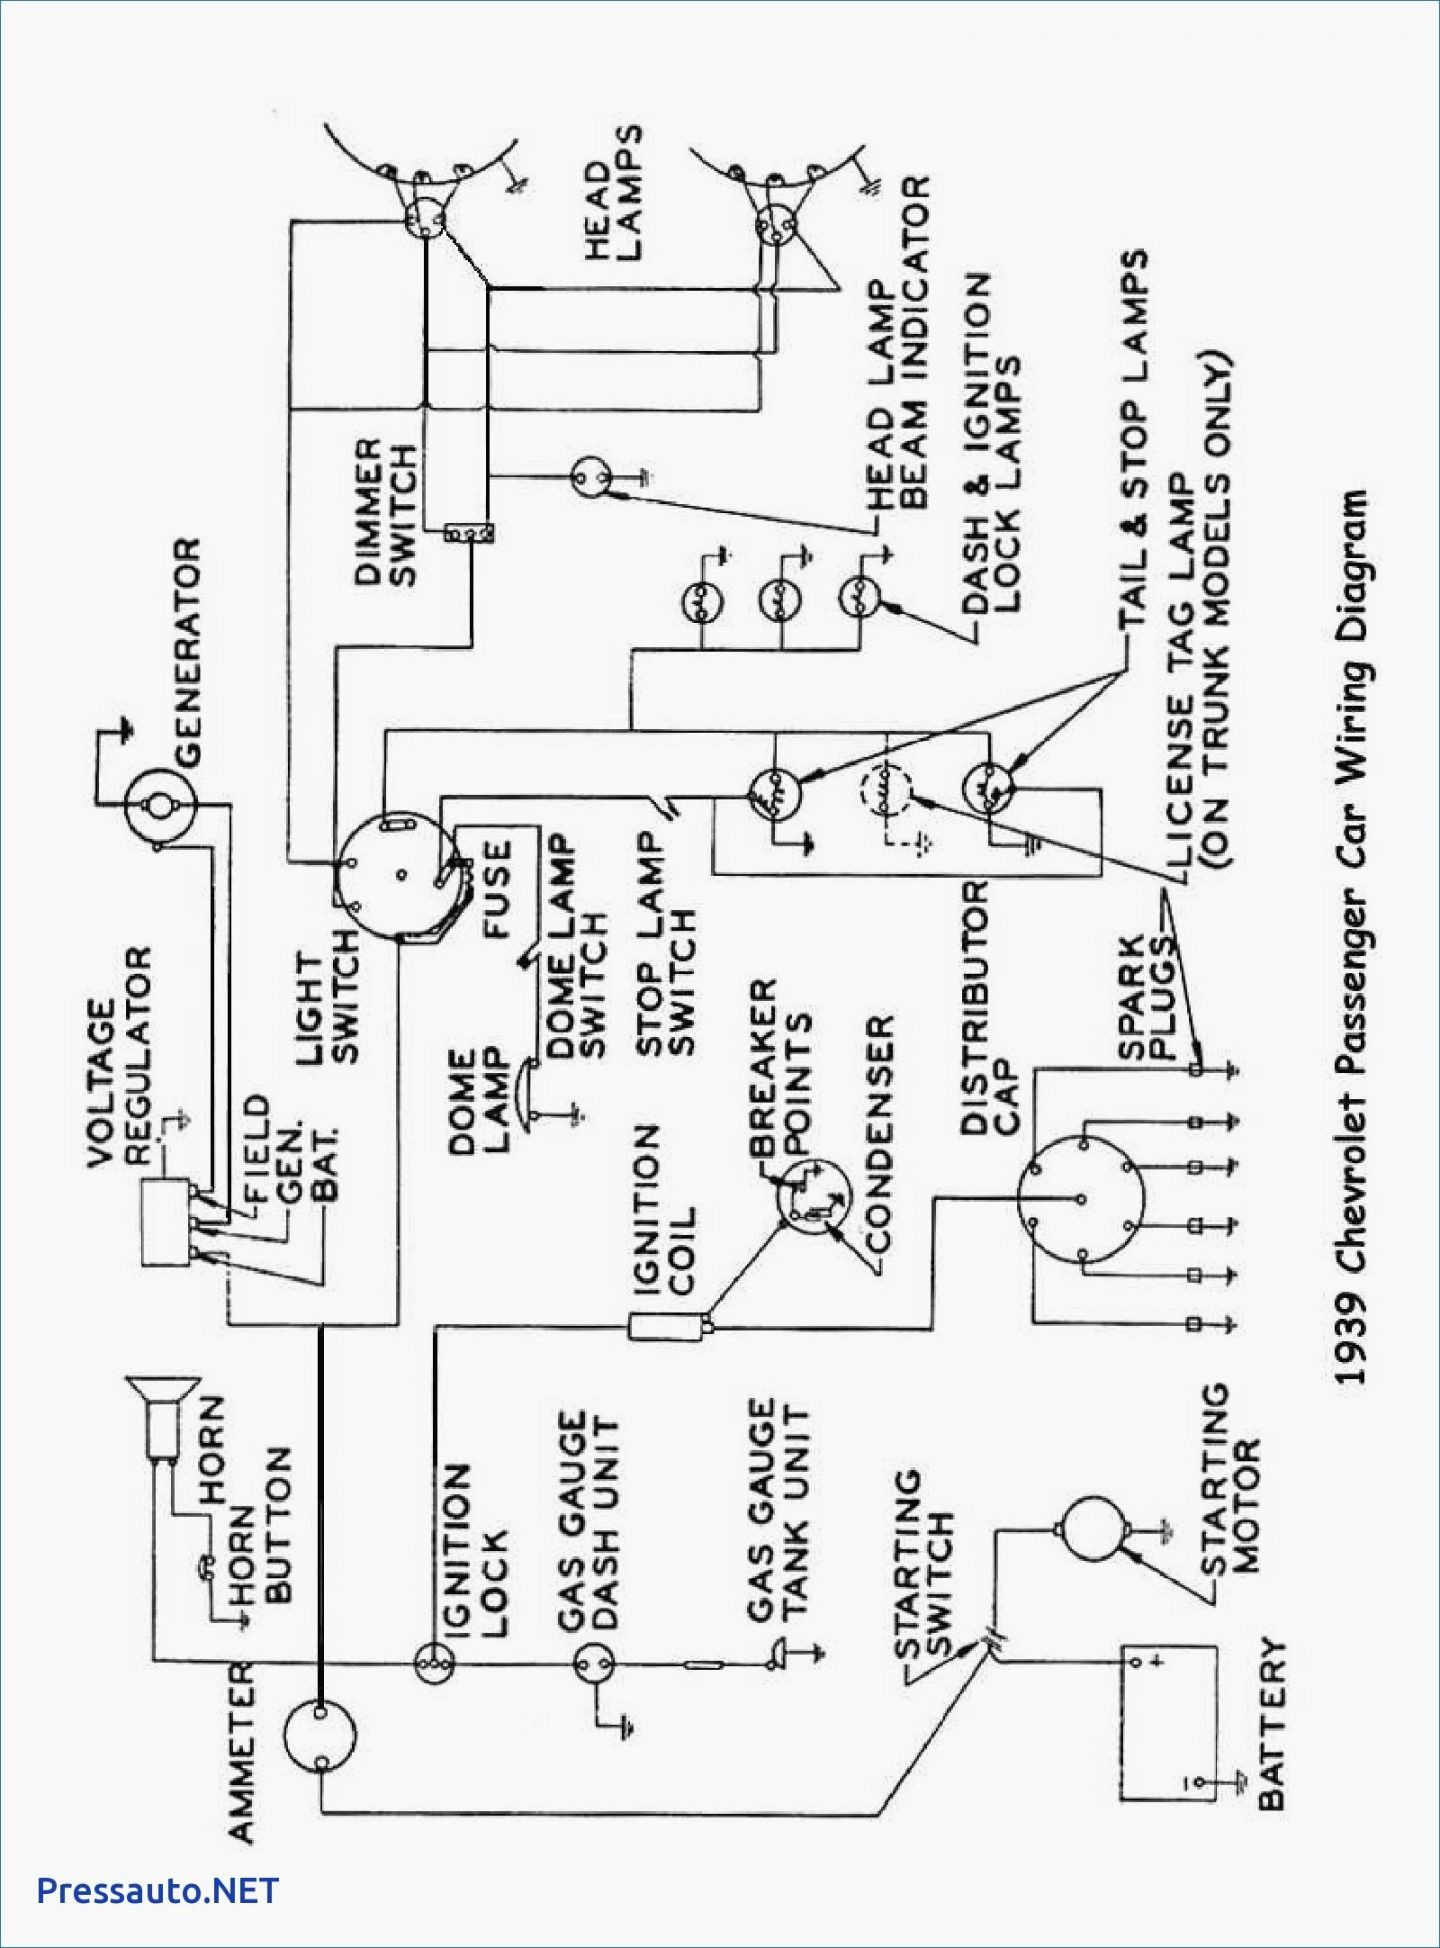 medium resolution of wiring diagram welding machine inspirationa best of pdf circuitwiring diagram welding machine inspirationa best of pdf